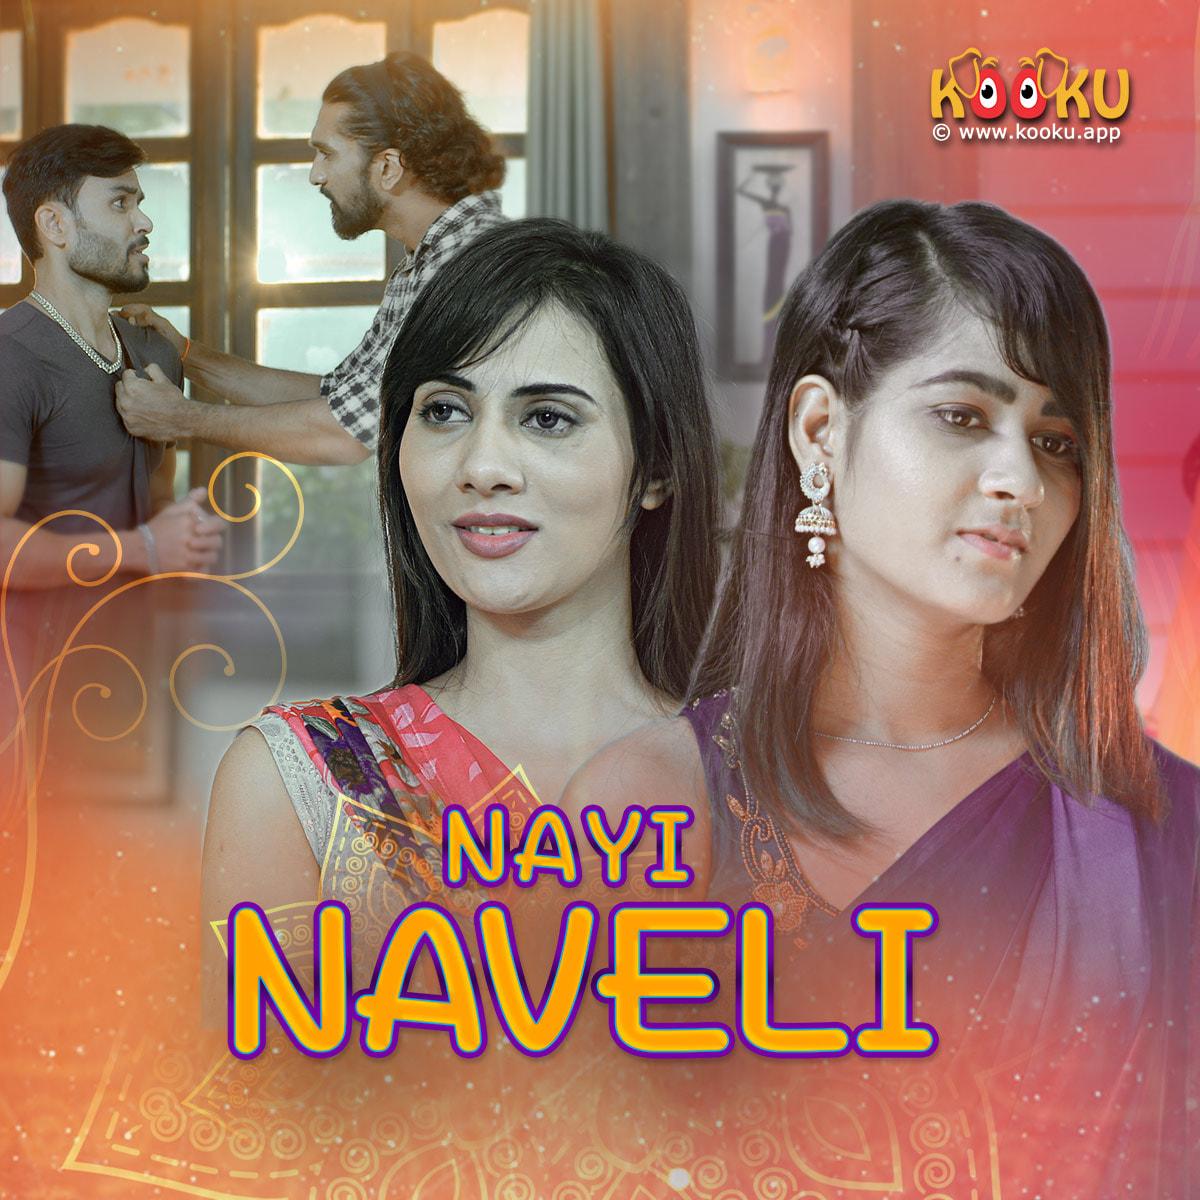 18+ Nayi Naveli (2021) S01 Hindi Kooku App Original Complete Web Series 720p HDRip 250MB Download